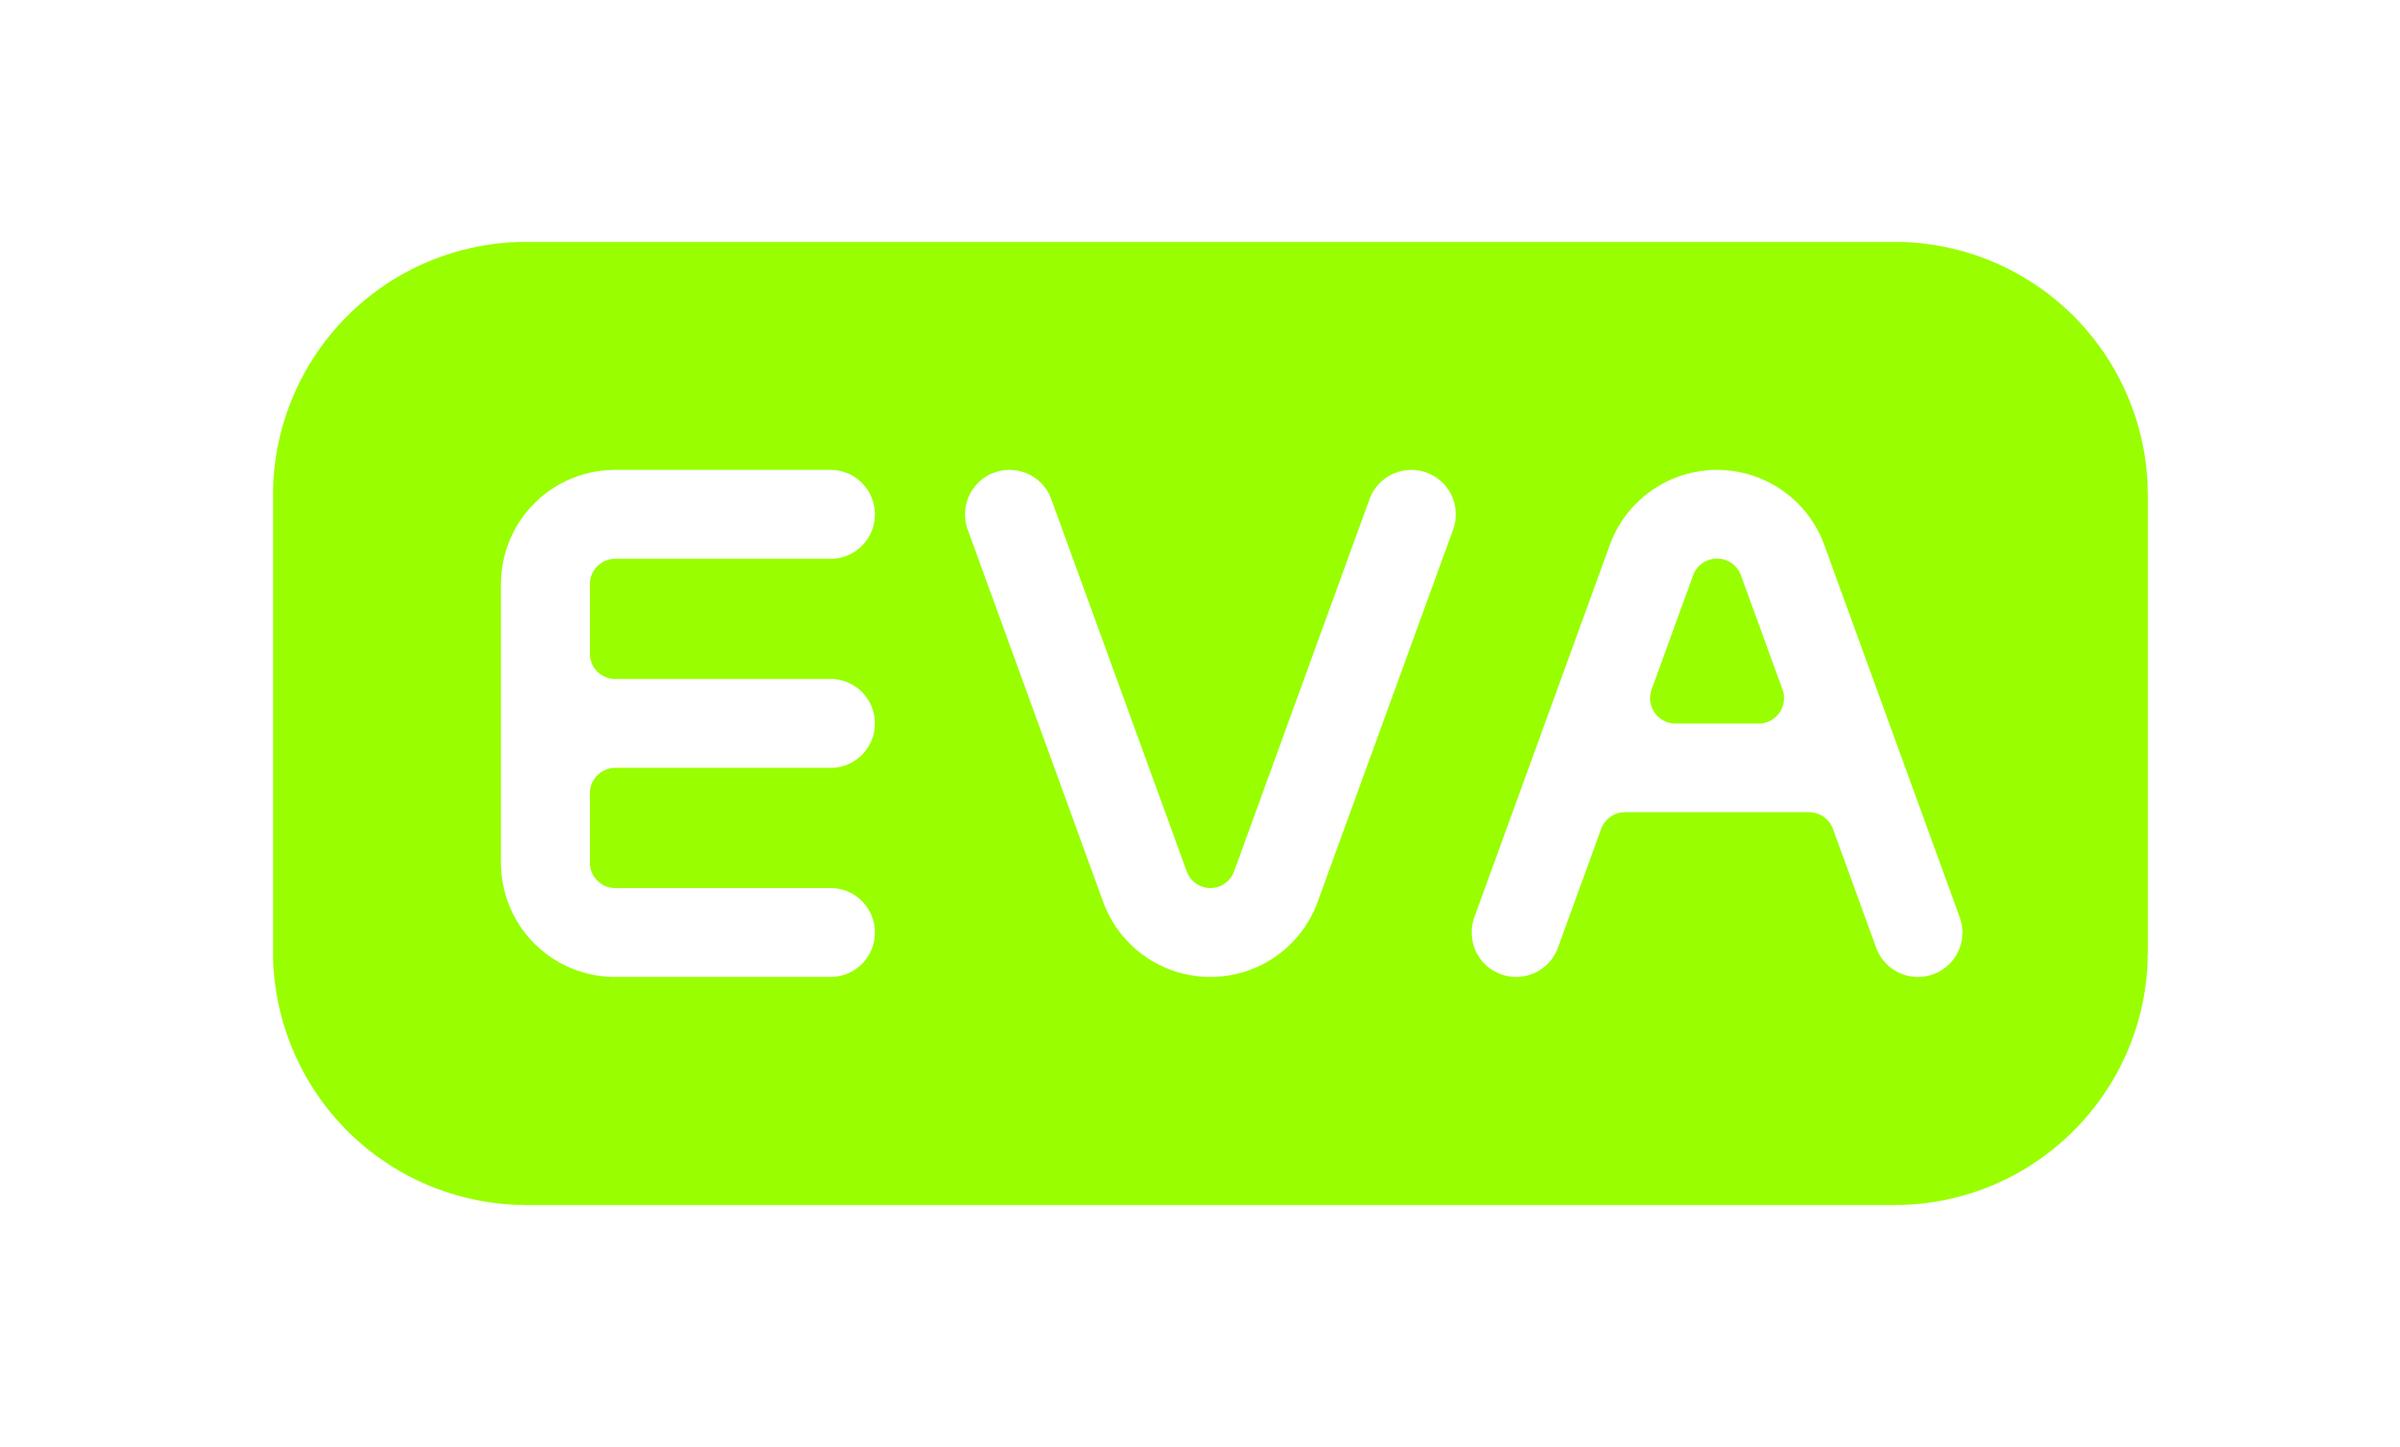 - 3_EVA_Logo